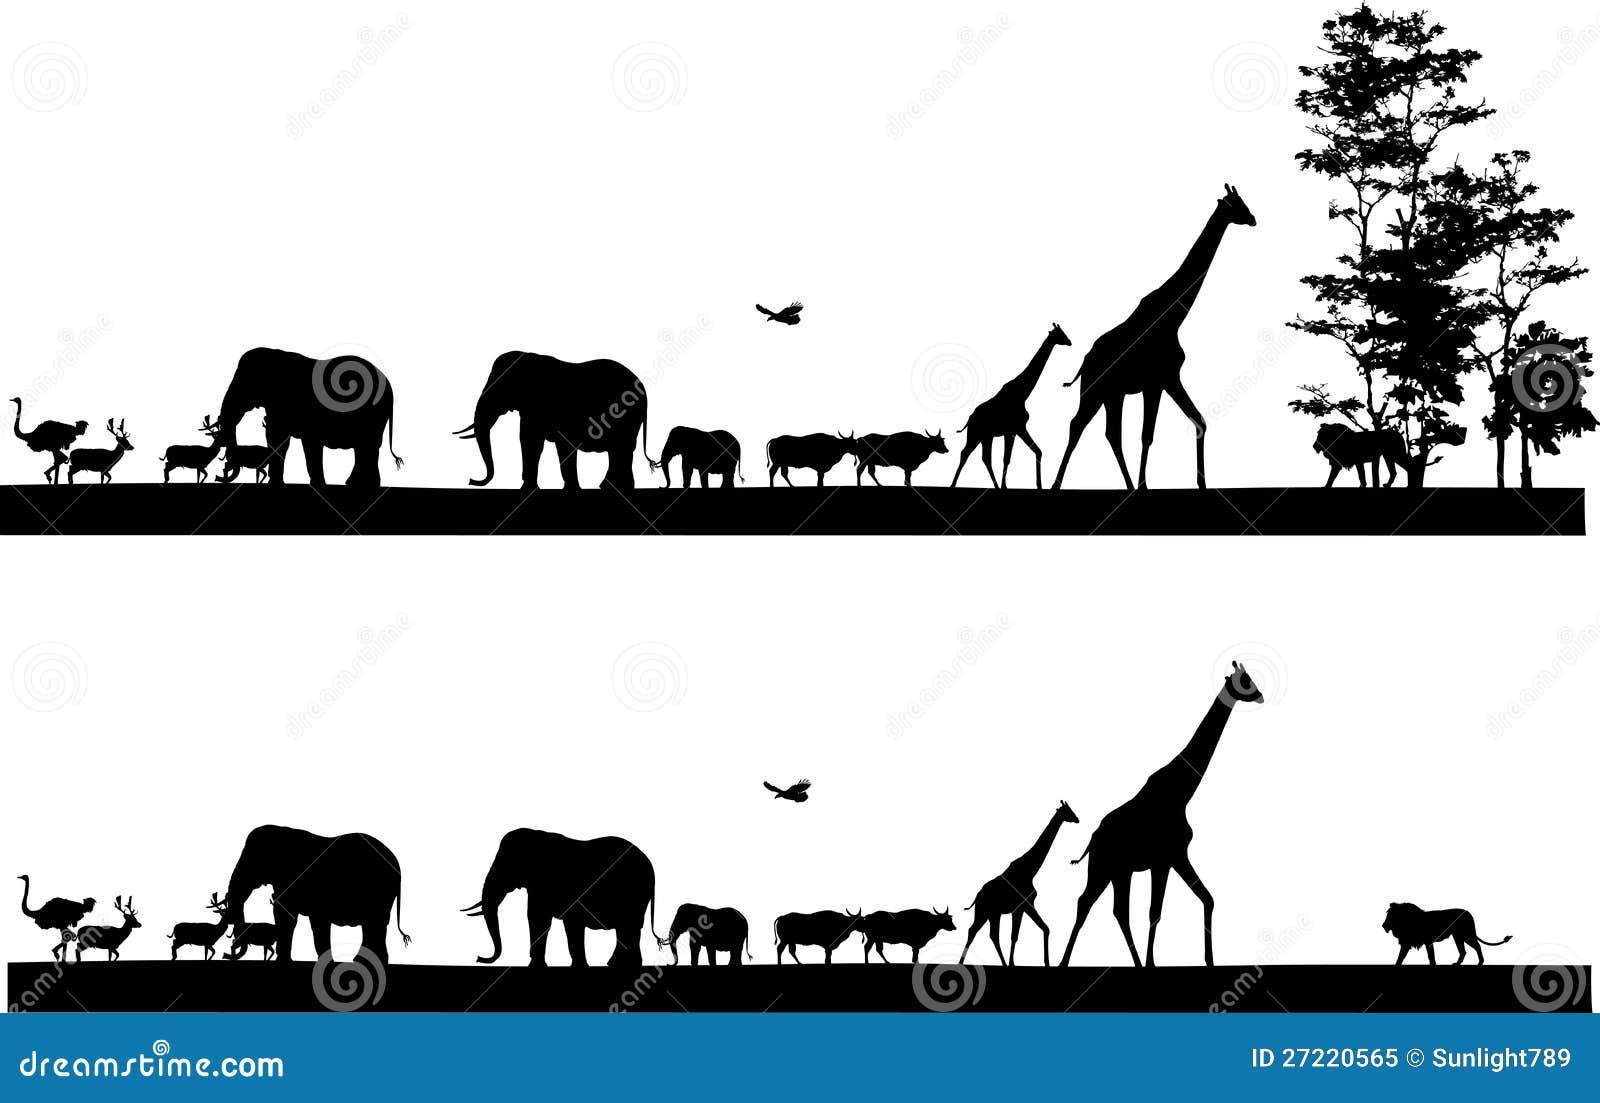 Safari animal silhouette stock illustration. Illustration ...